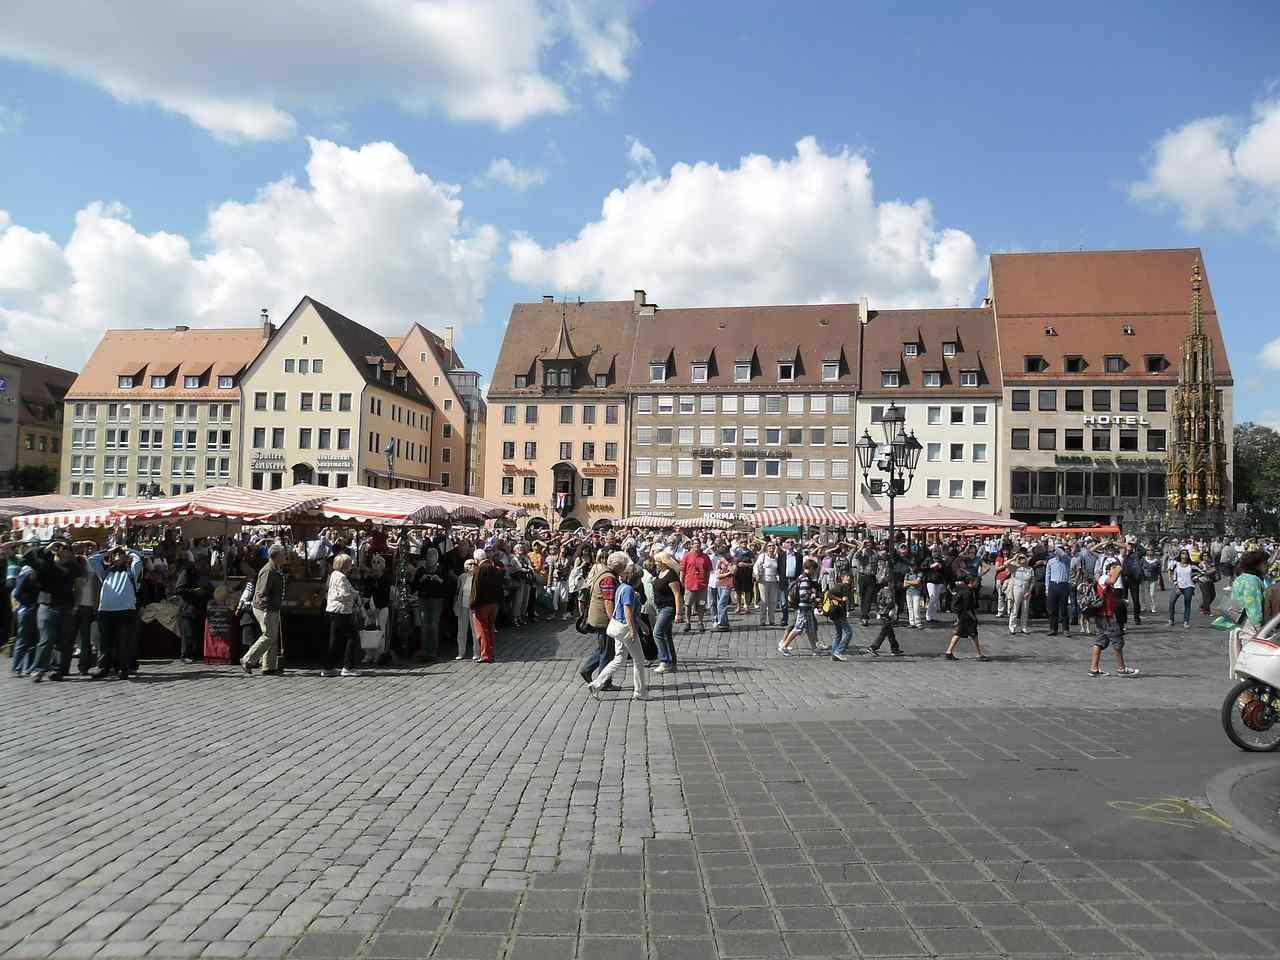 Hauptmarkt, Nuremberg, Germany